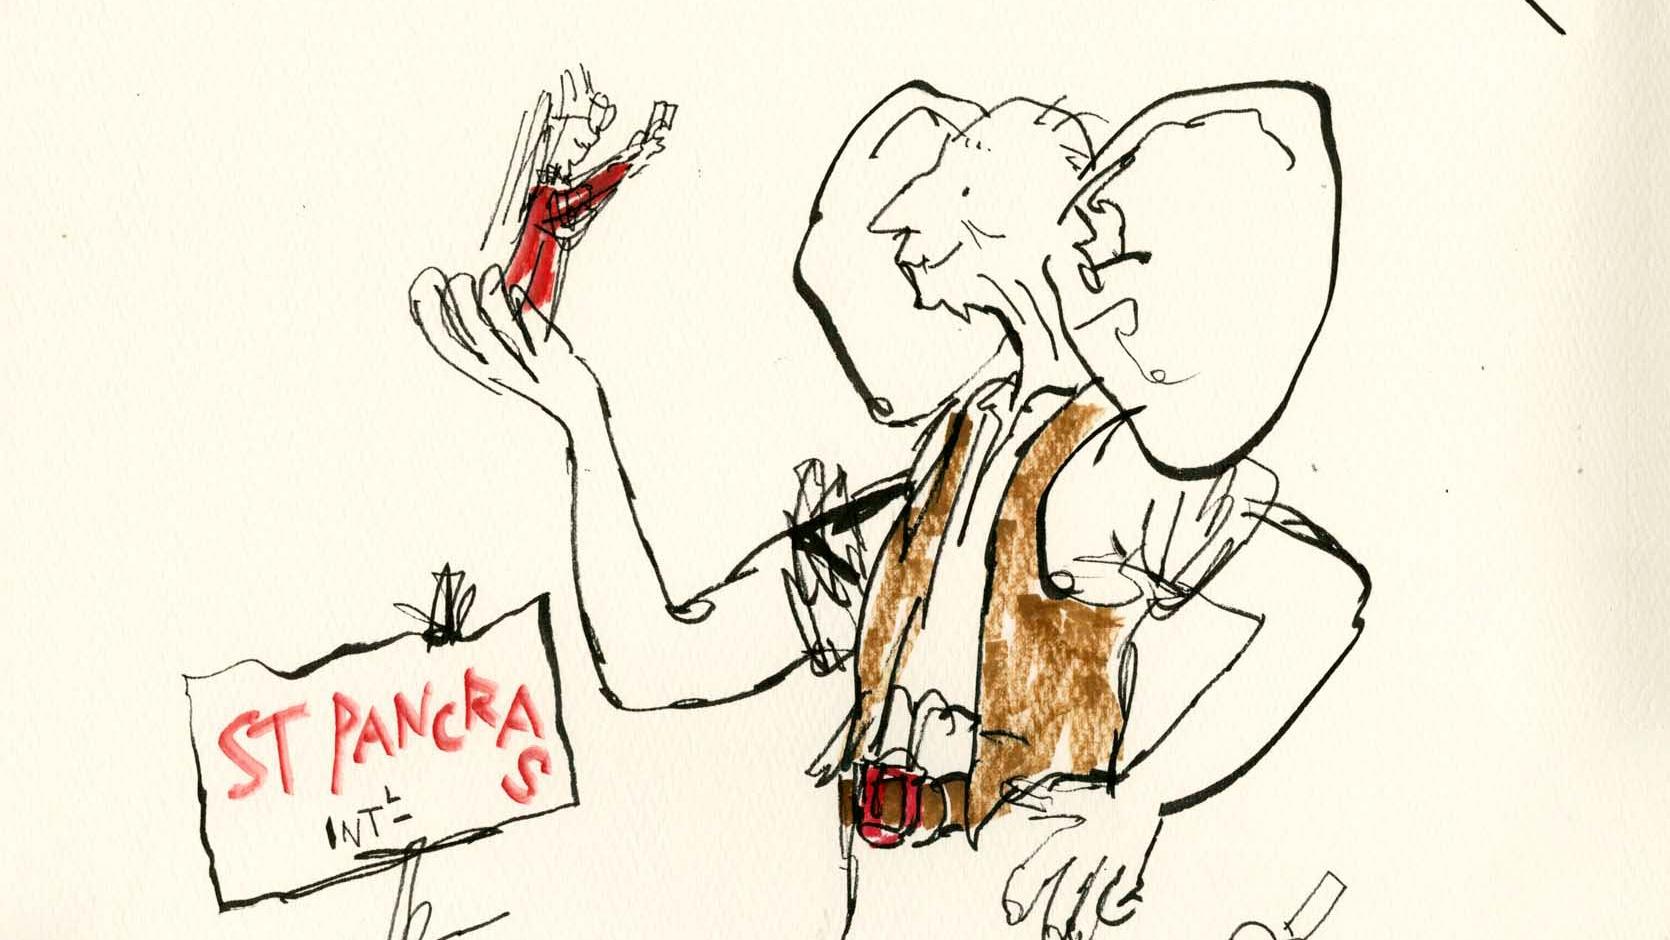 1670x940 Quentin Blake Has Drawn A New Bfg Illustration